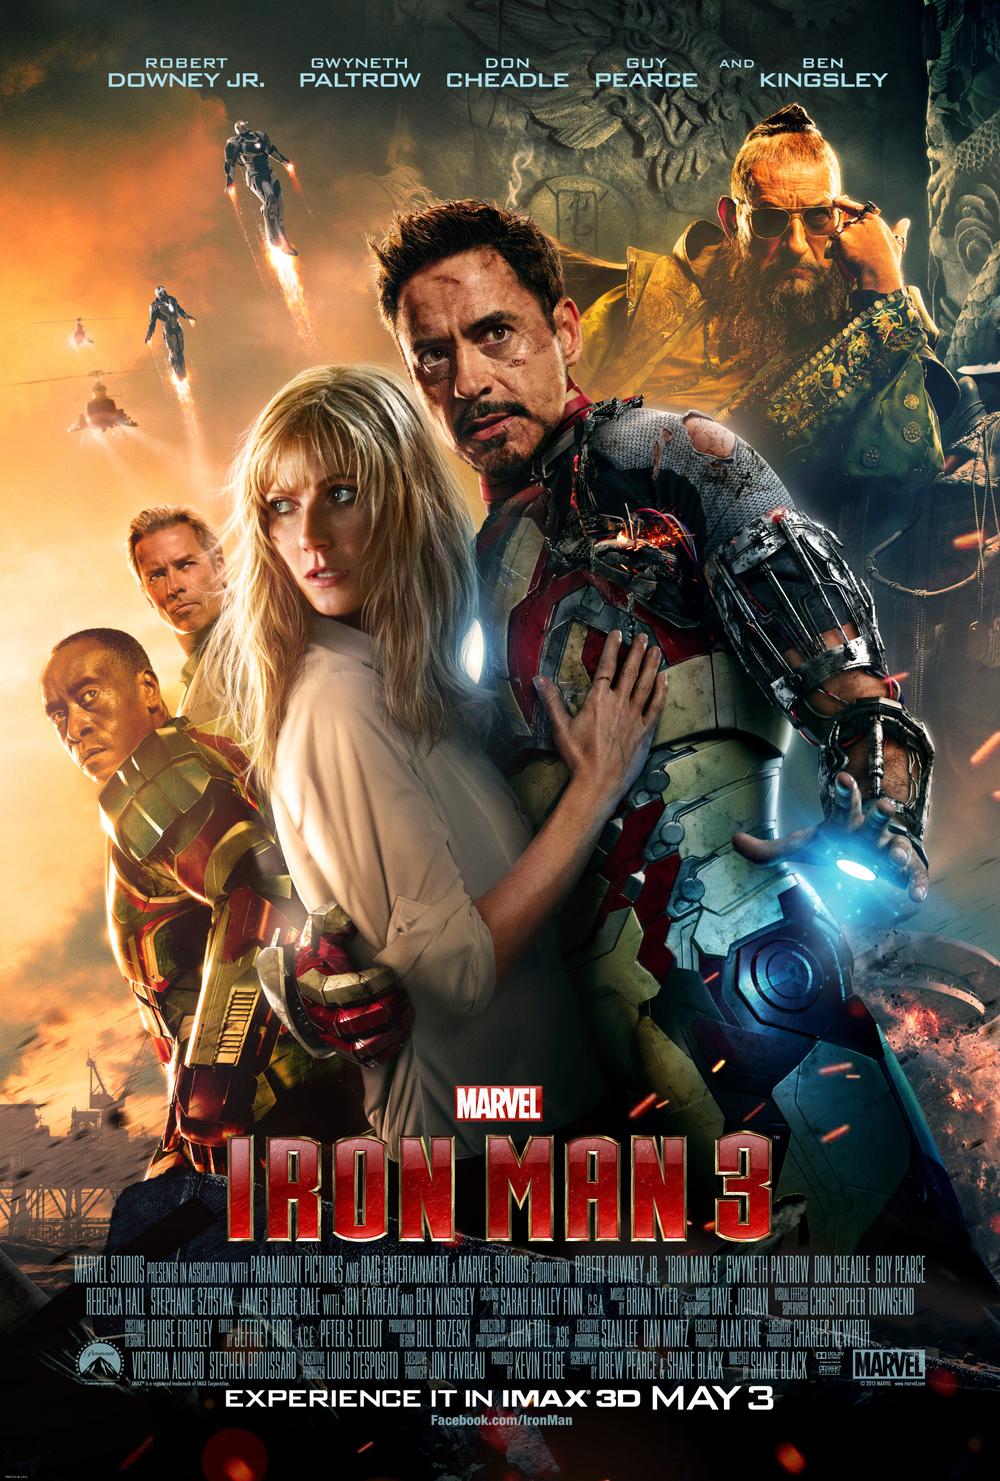 Iron-Man-3-IMAX-poster1.jpg